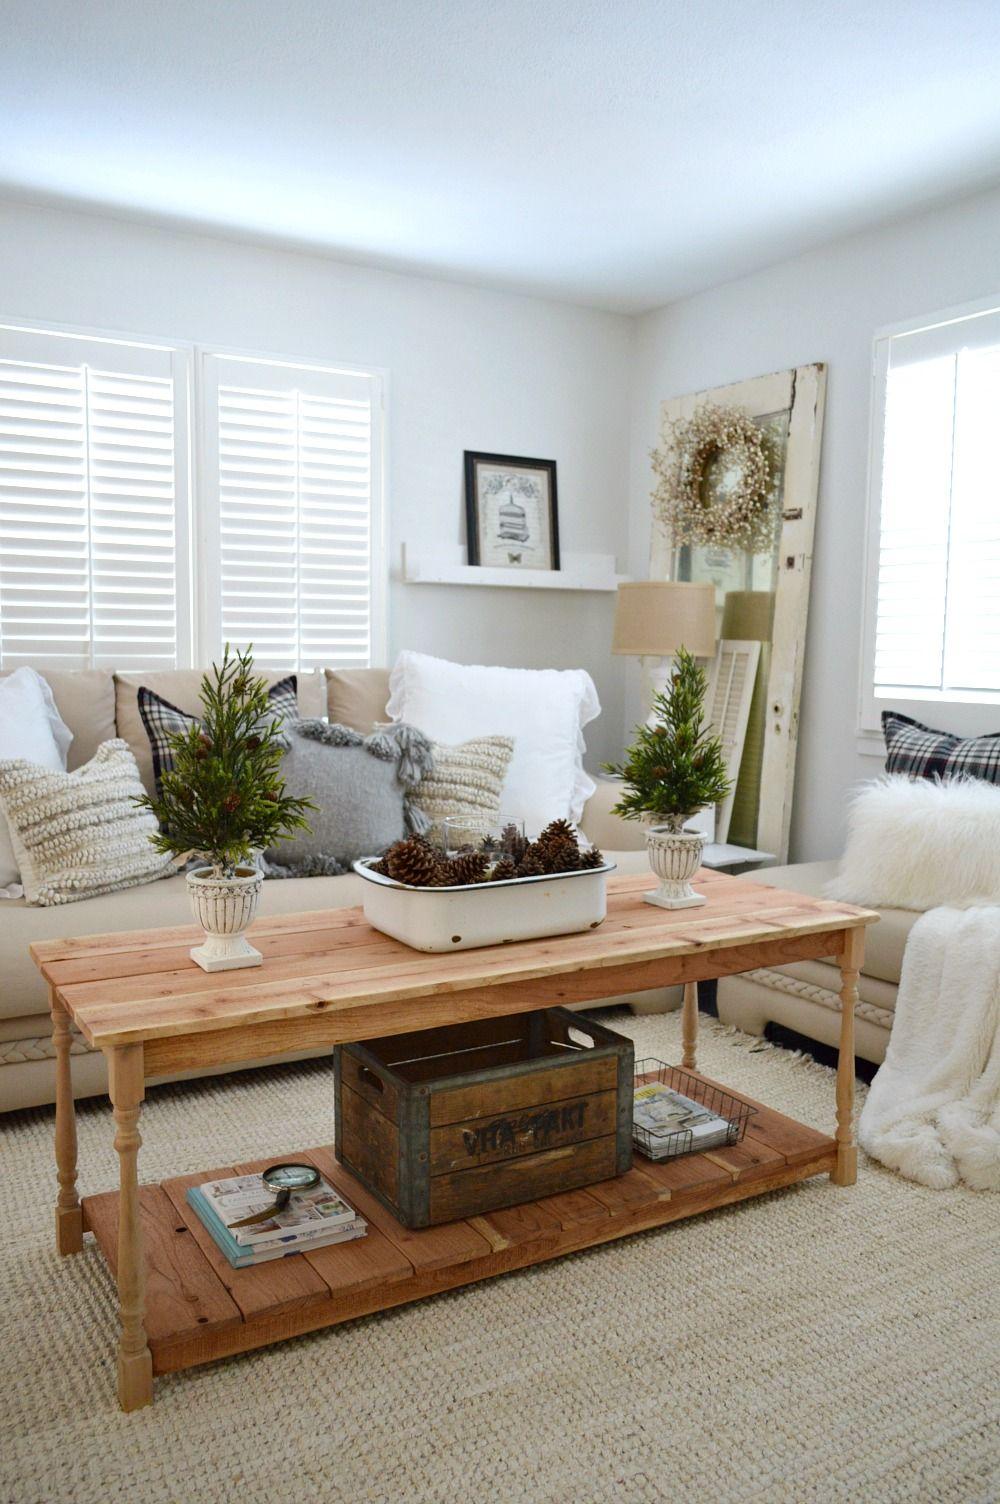 Cozy cottage farmhouse winter decorating ideas coffee